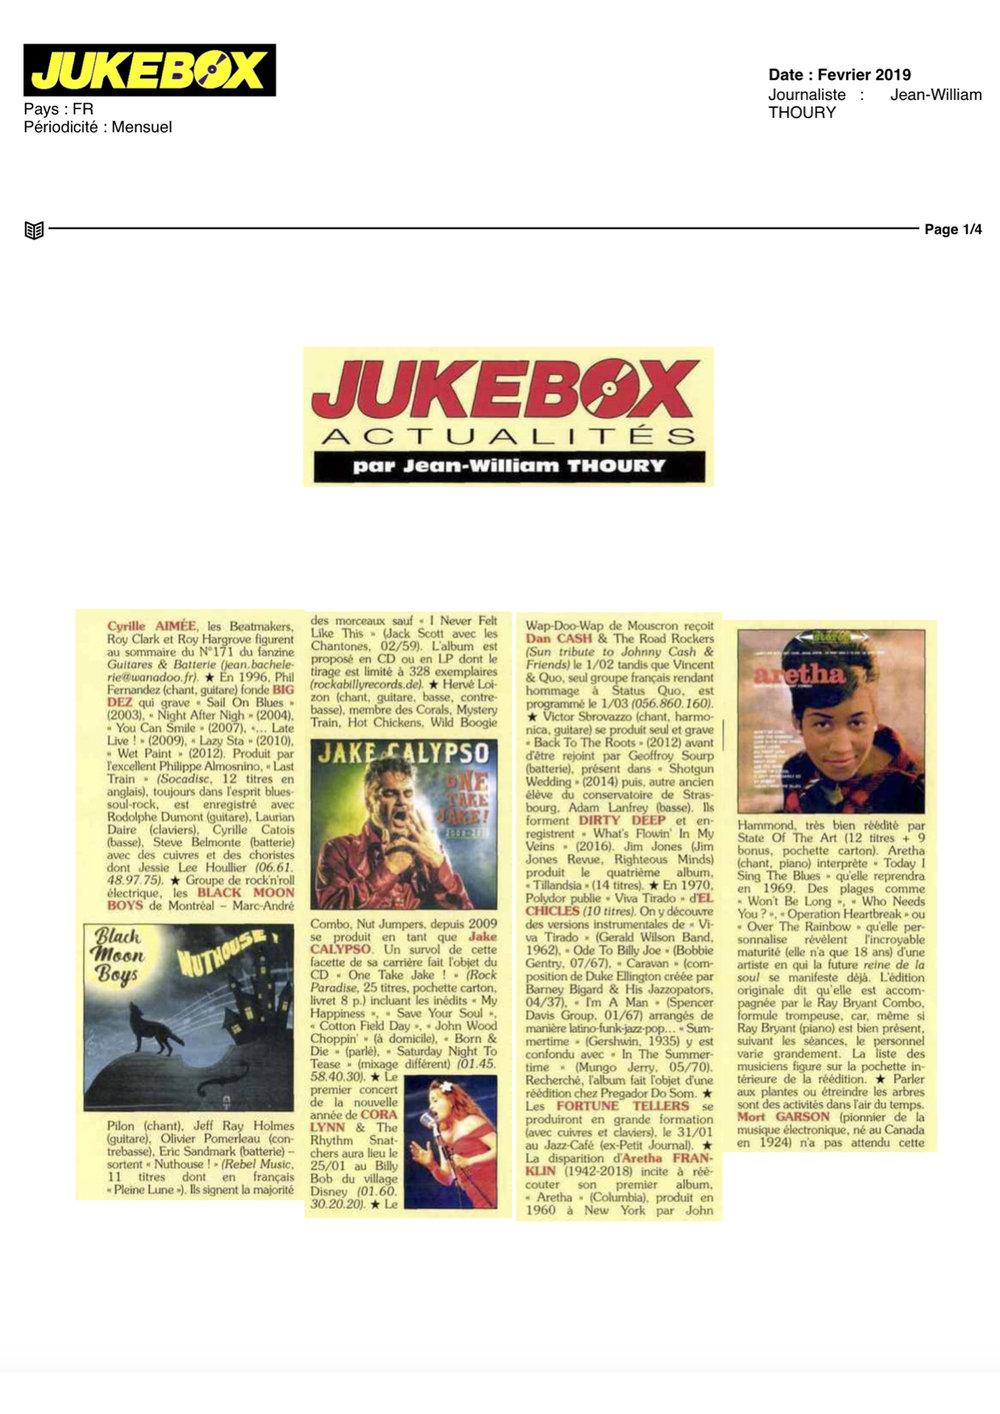 YL_JUKEBOX P2 FEV 2019.jpg